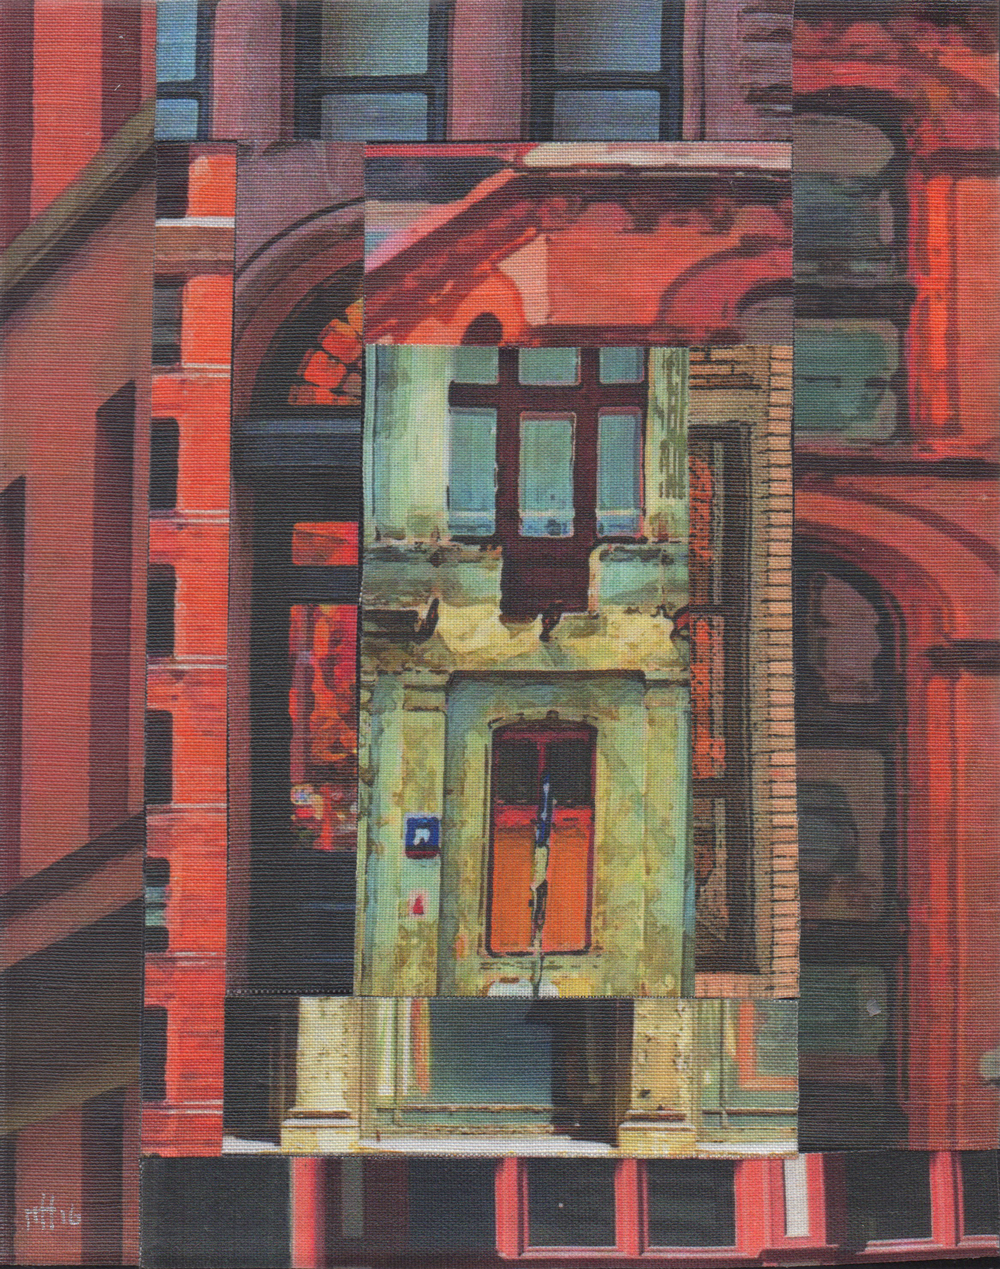 patchwork city 53